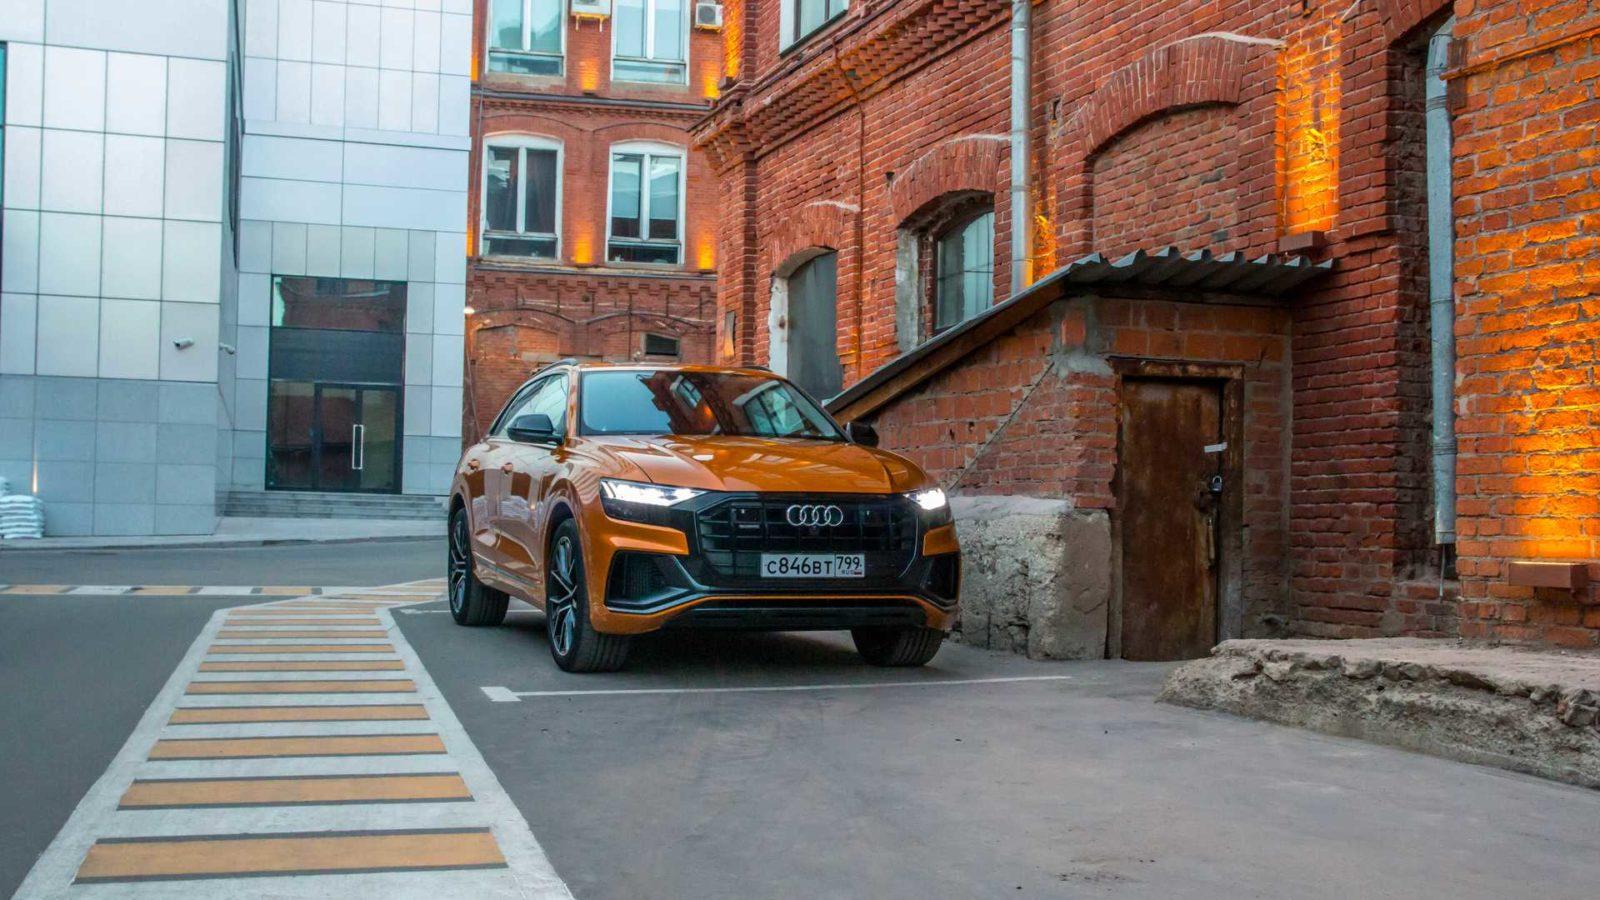 2020 Audi Q8 foto, jekster'er, vid speredi, tehnicheskie harakteristiki, cena, data vyhoda — video